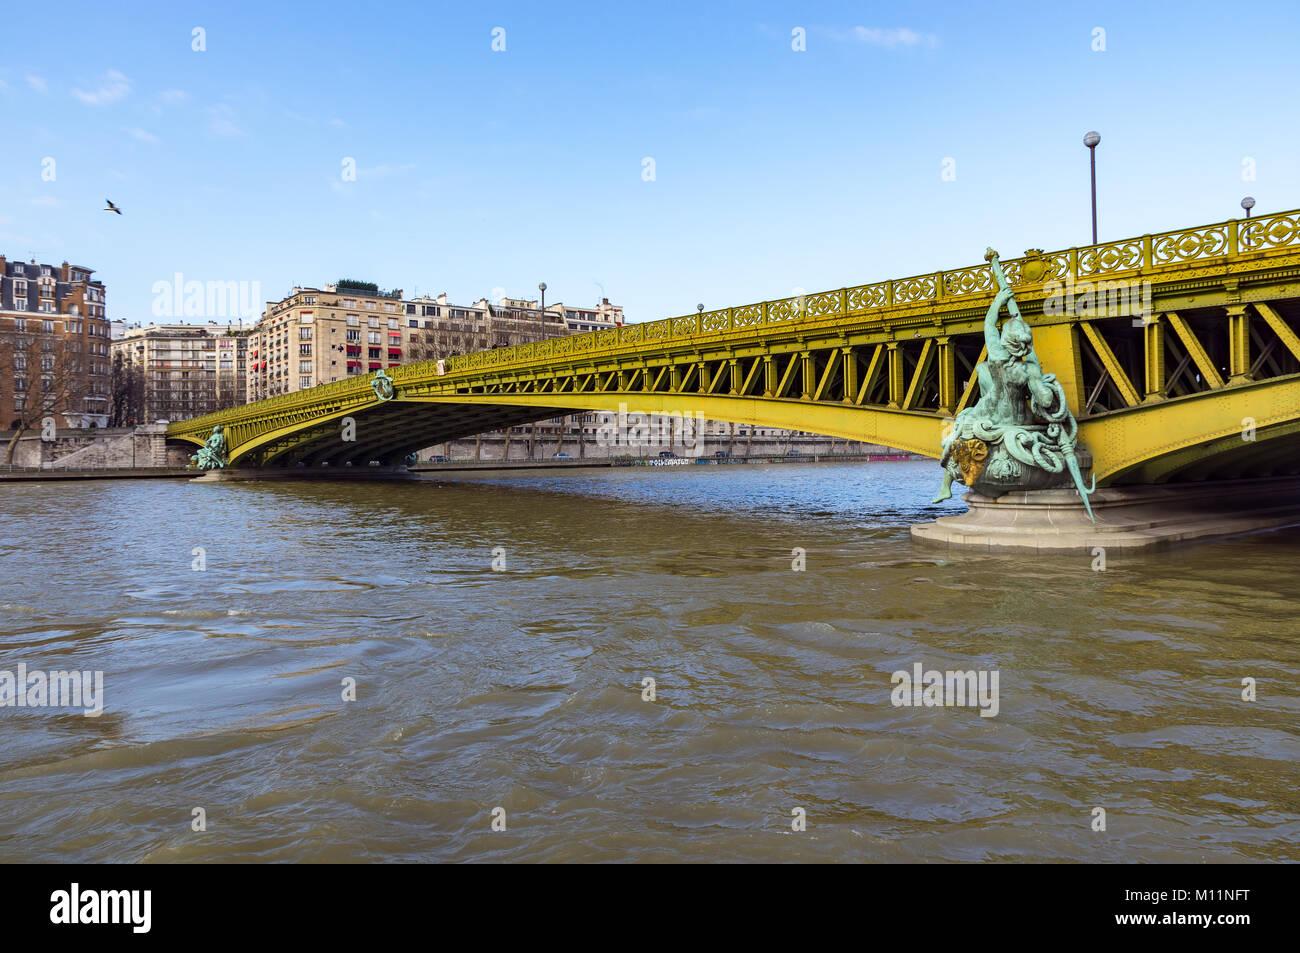 Pont Mirabeau over the Seine - Paris France. - Stock Image